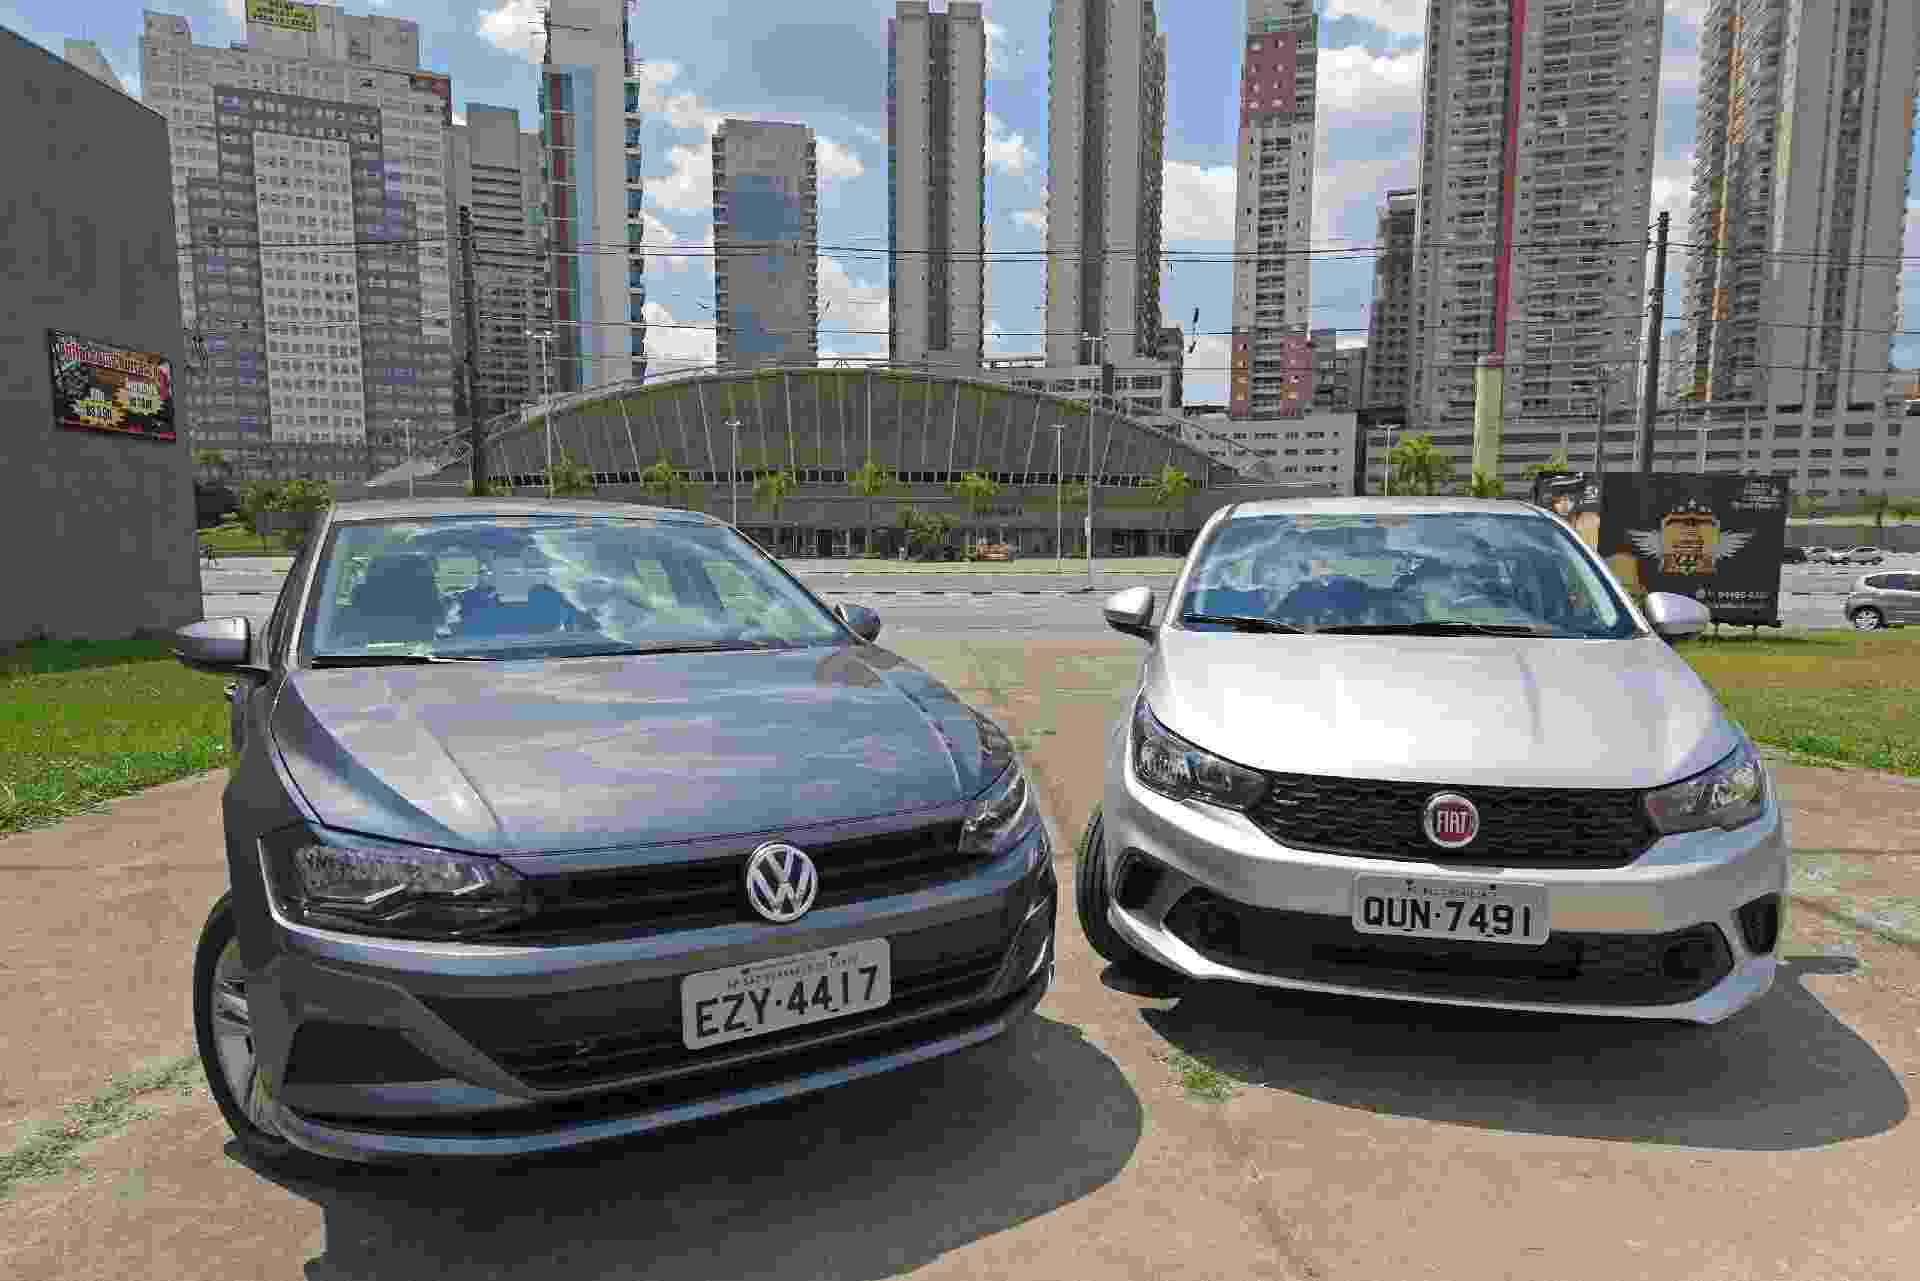 Duelo: Volkswagen Polo 1.0 MPI x Fiat Argo 1.0 Drive - Murilo Góes/UOL